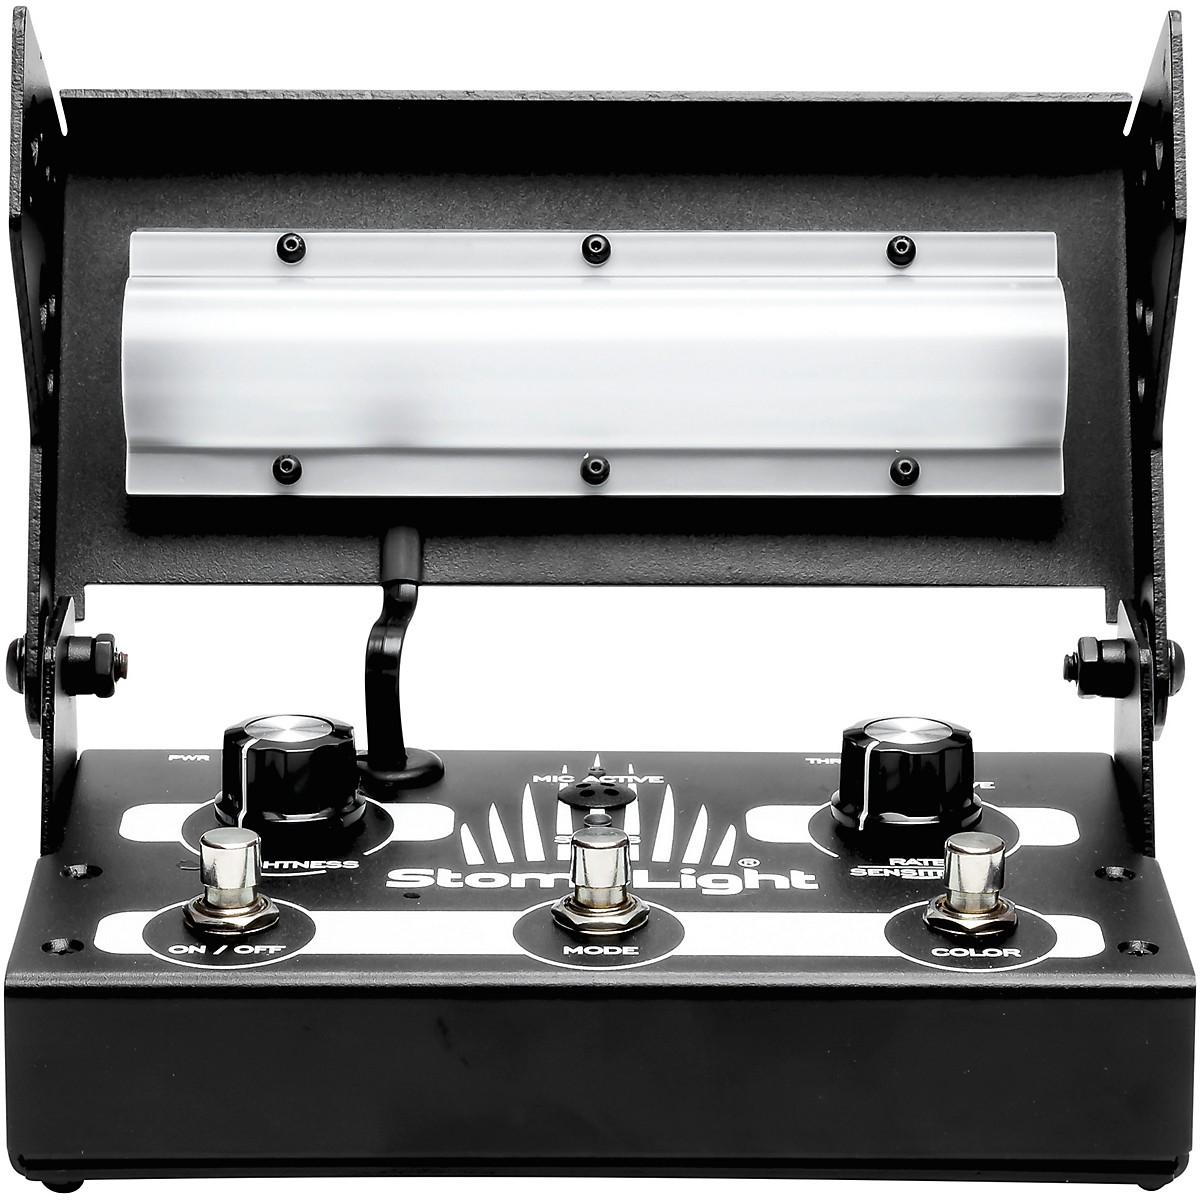 StompLight DMX Pro Lighting Effects Pedal